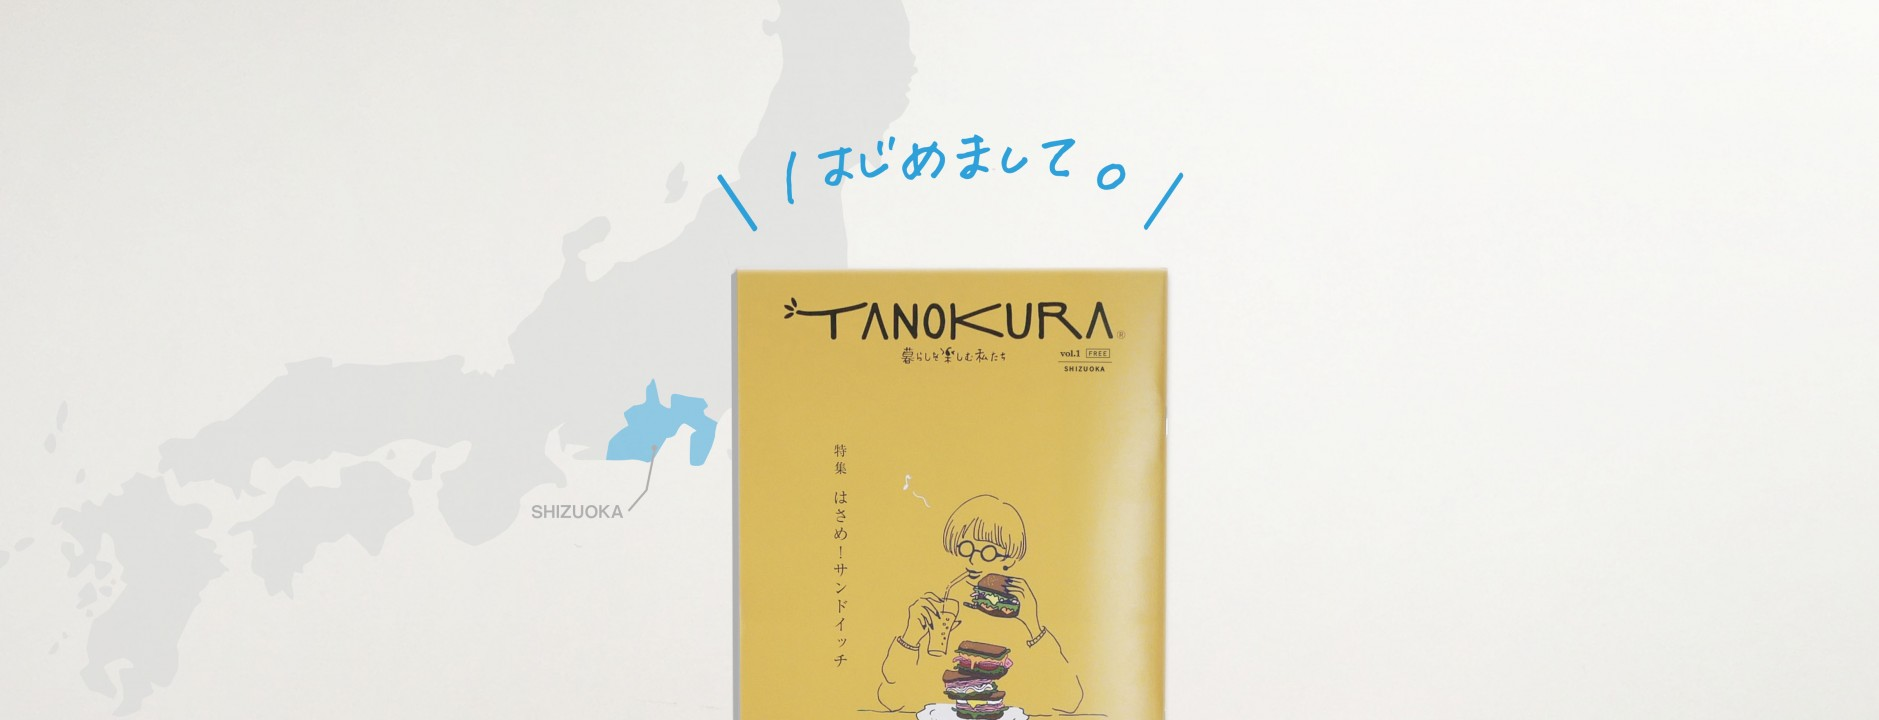 創刊号 | TANOKURA SHIZUOKA vol.1